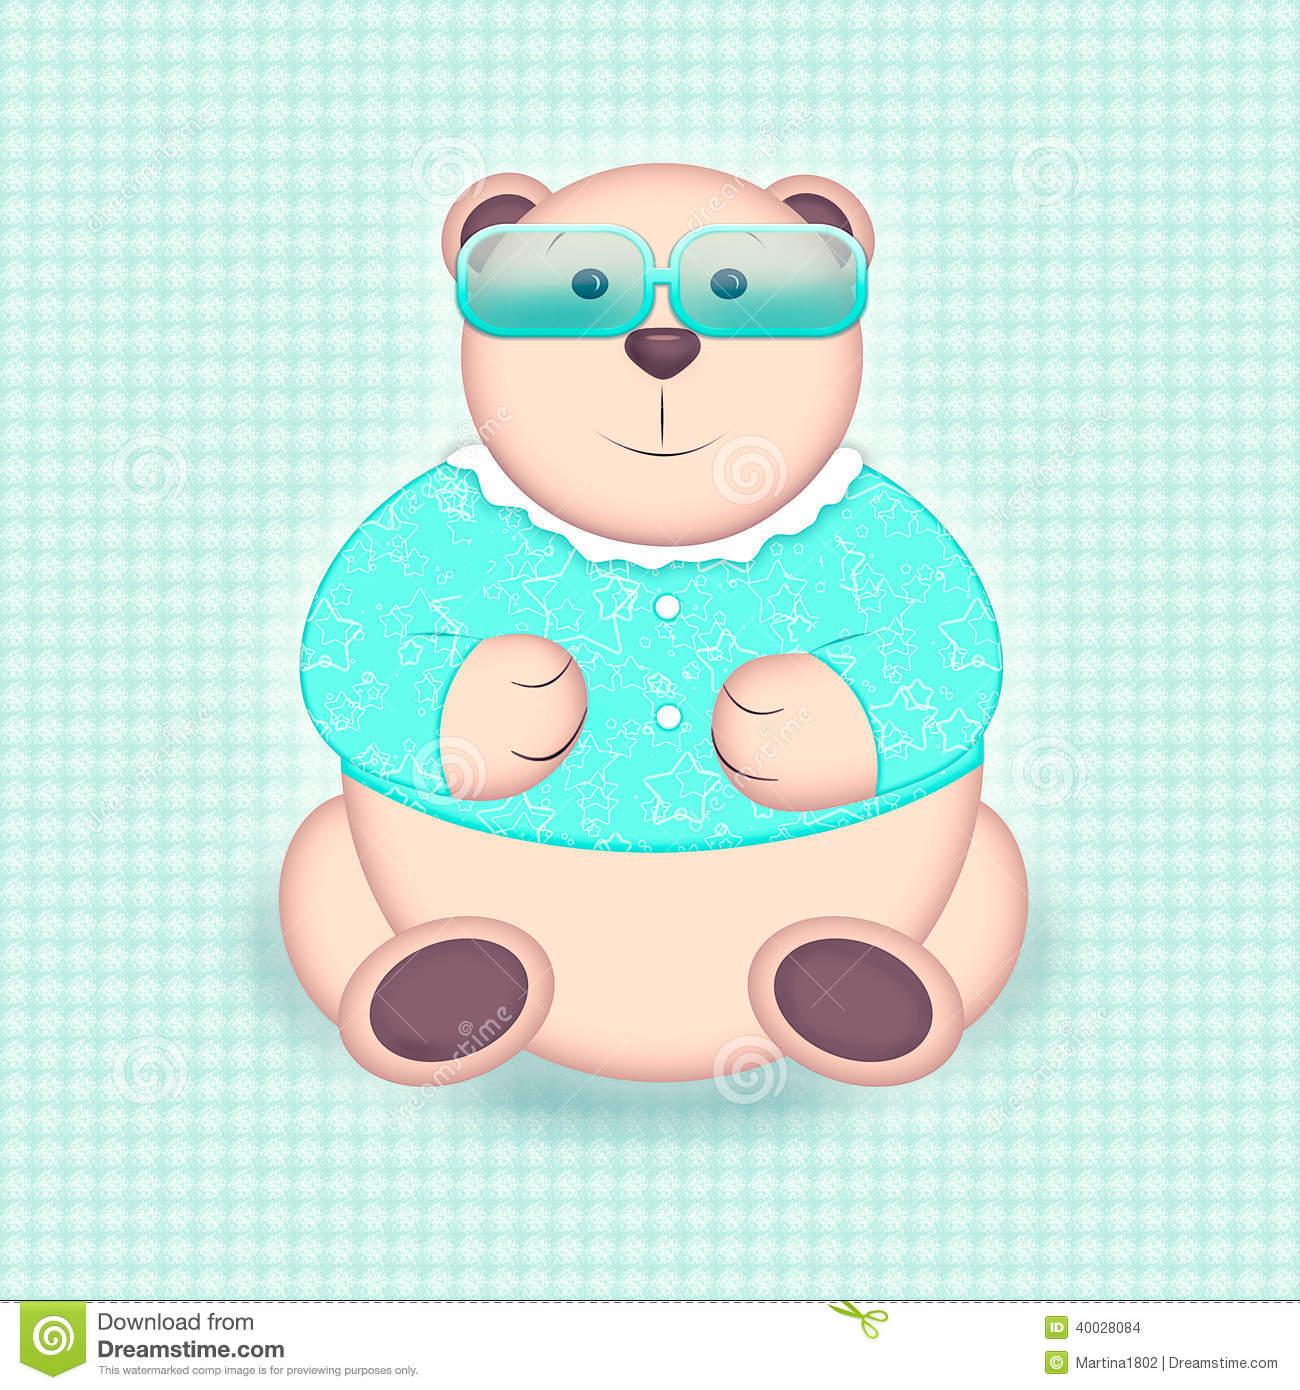 Mint green sunglasses clipart jpg freeuse Bear Portrait In Sunglasses Stock Illustration - Image: 40028084 jpg freeuse